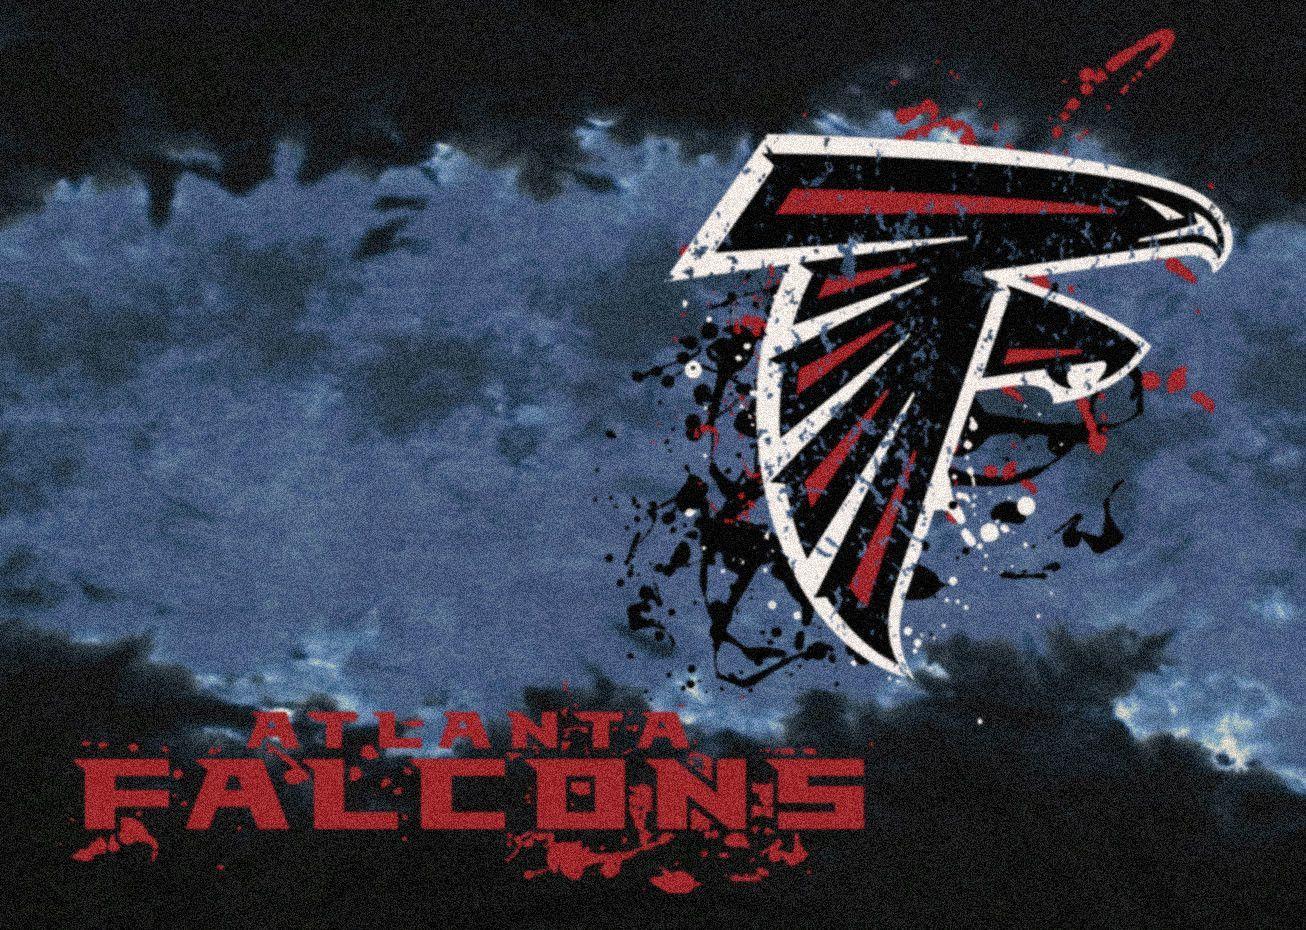 Nfl Team Fade Atlanta Falcons Novelty Rug Atlanta Falcons Atlanta Falcons Crafts Atlanta Falcons Logo